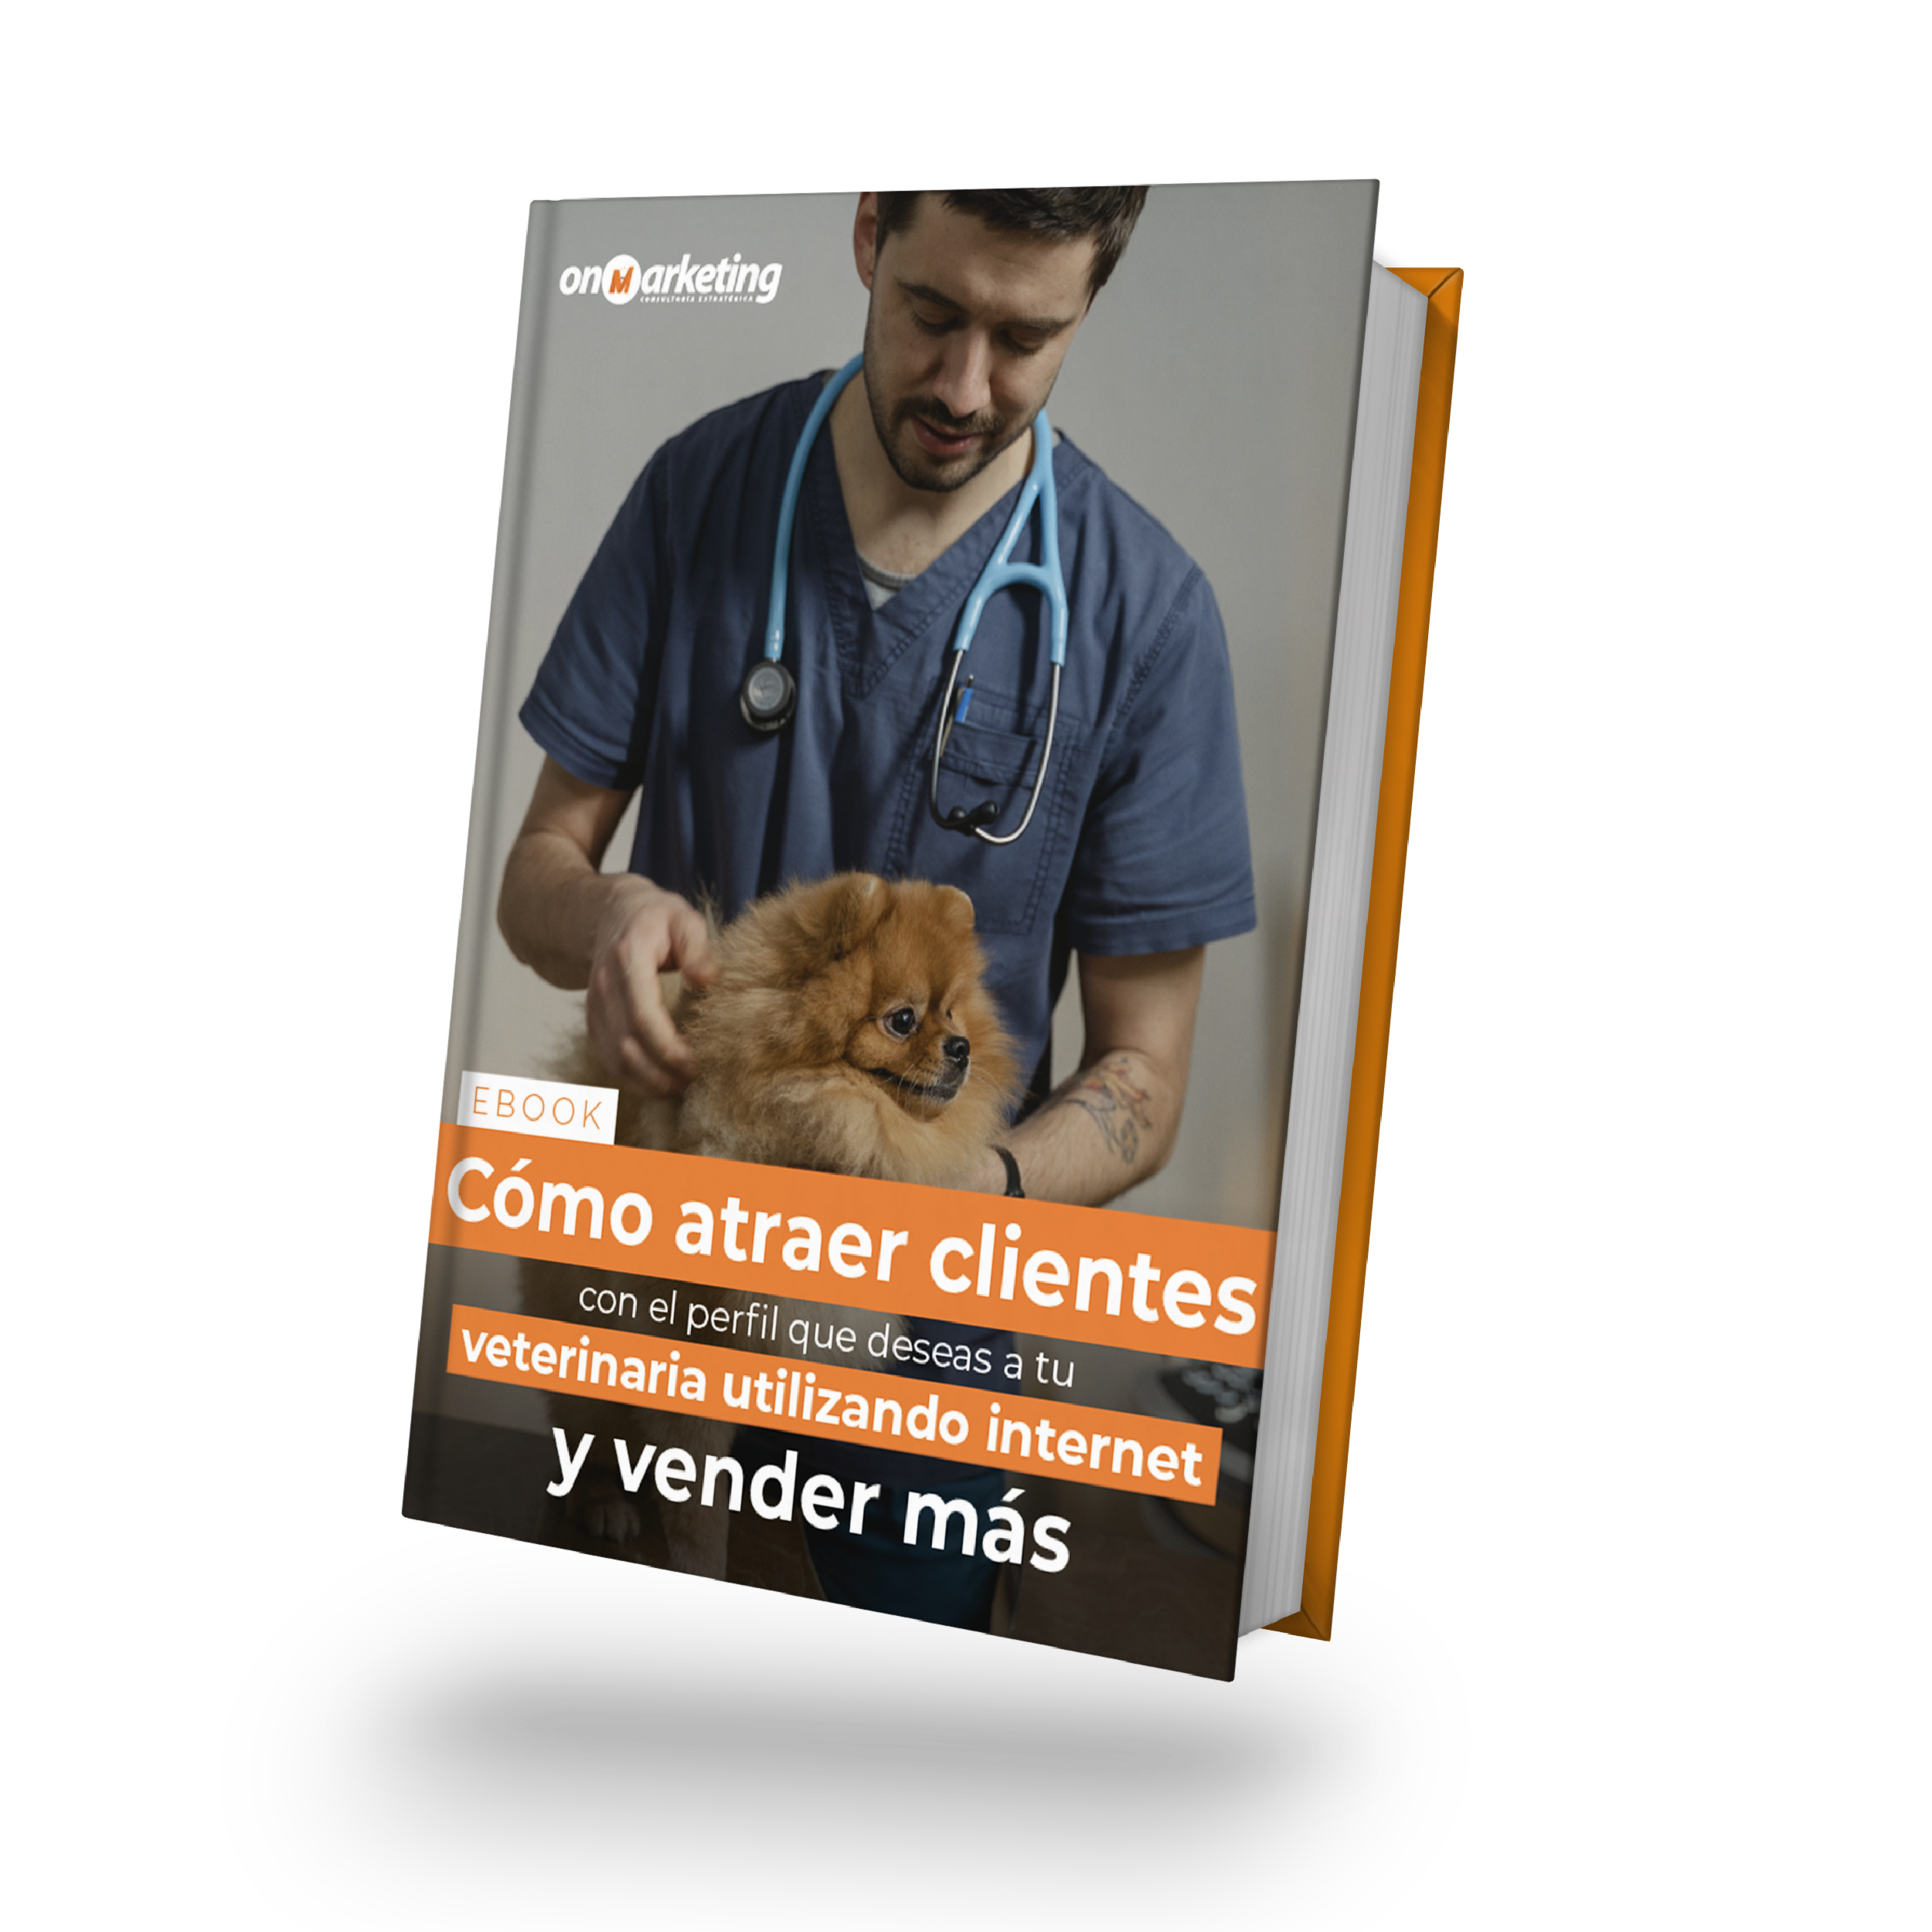 OnMarketing-Veterinarias-Clientes-Vetasporinternet